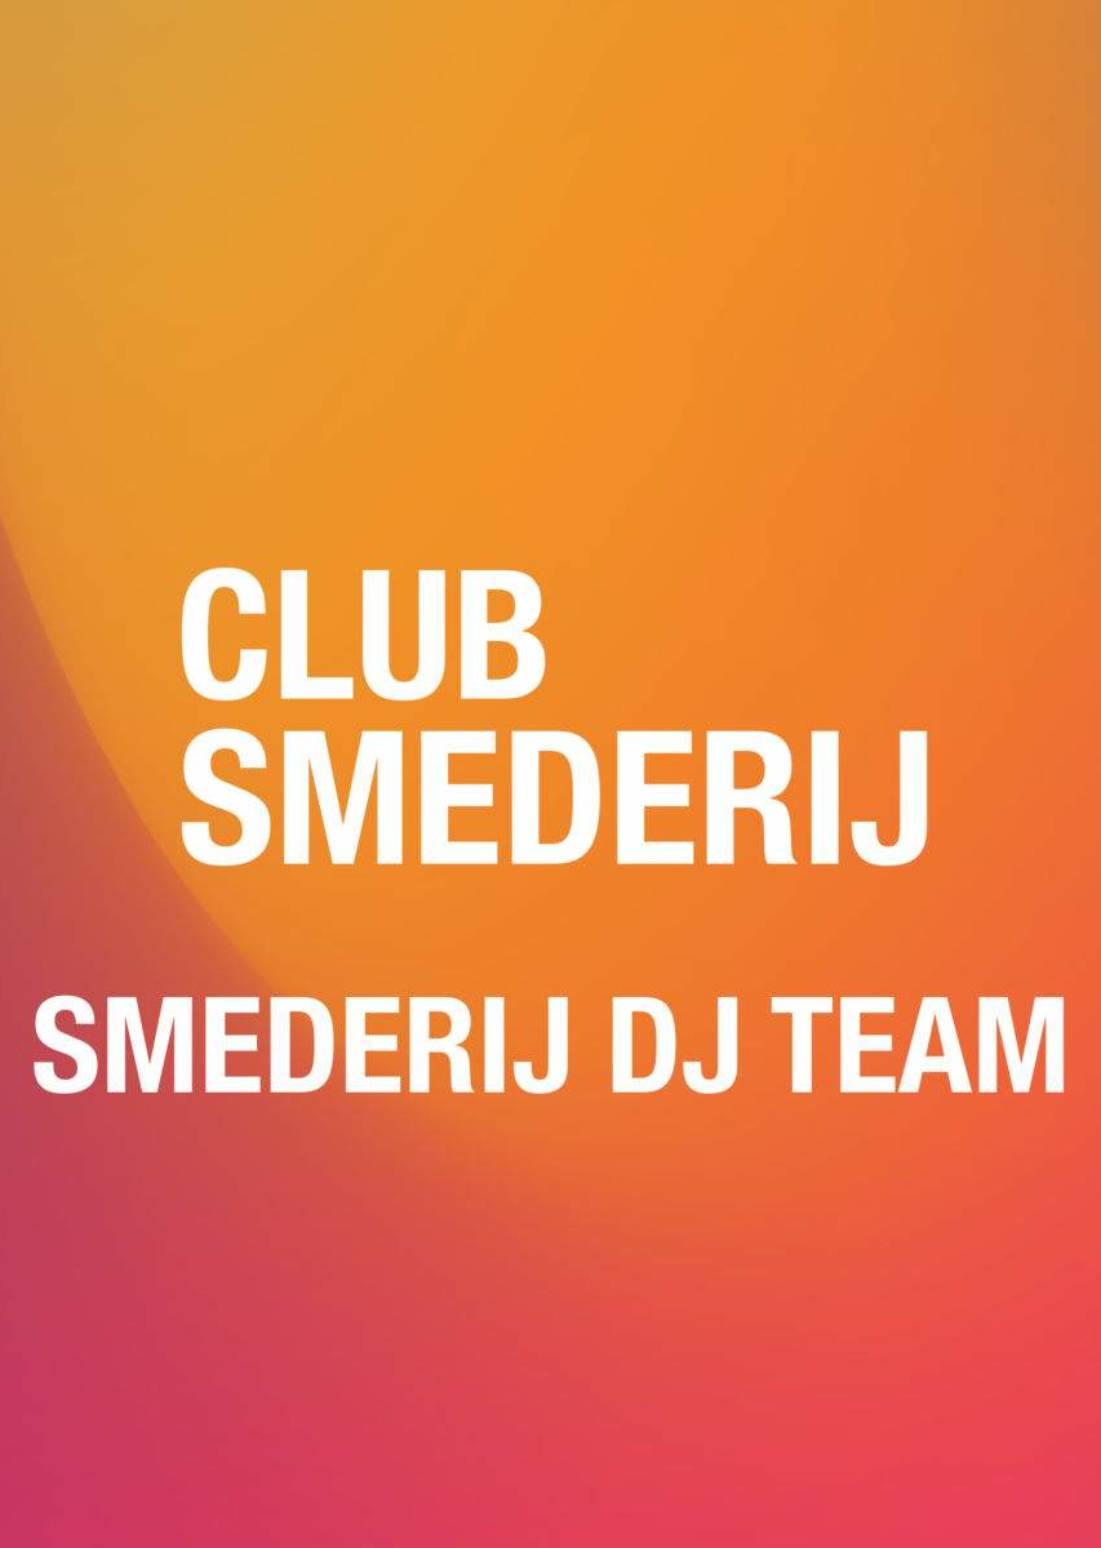 SMEDERIJ DJ TEAM | Smederijtuin